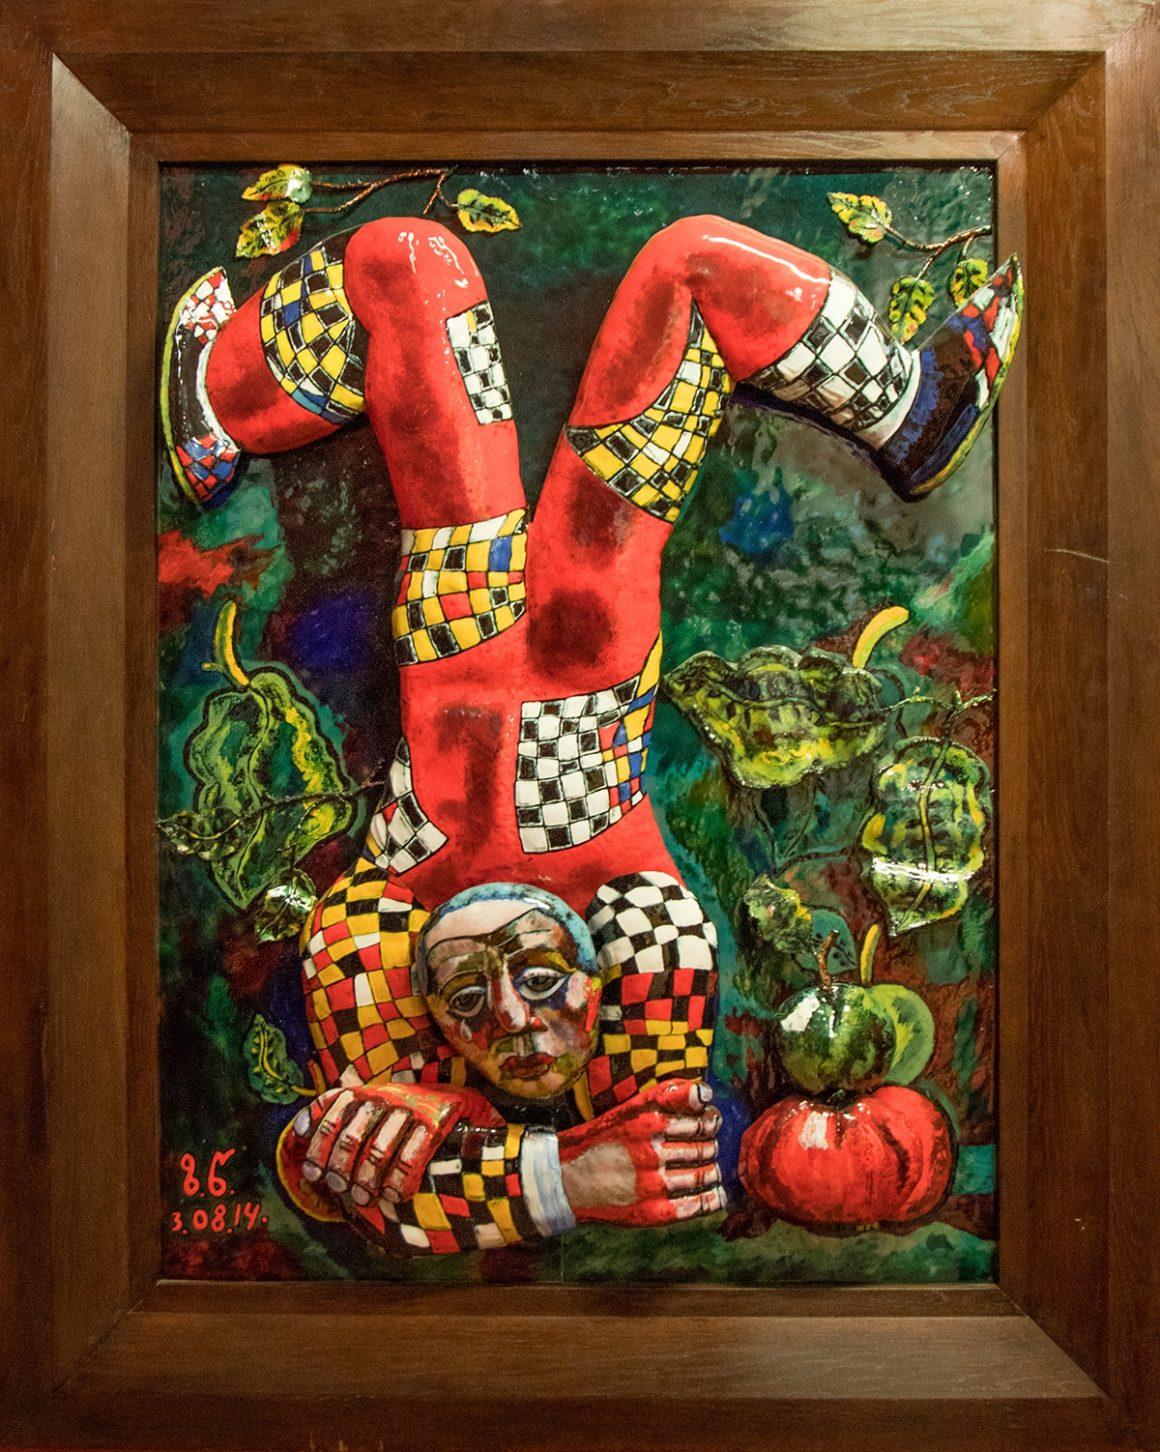 Biba. From the Circus series – 2015